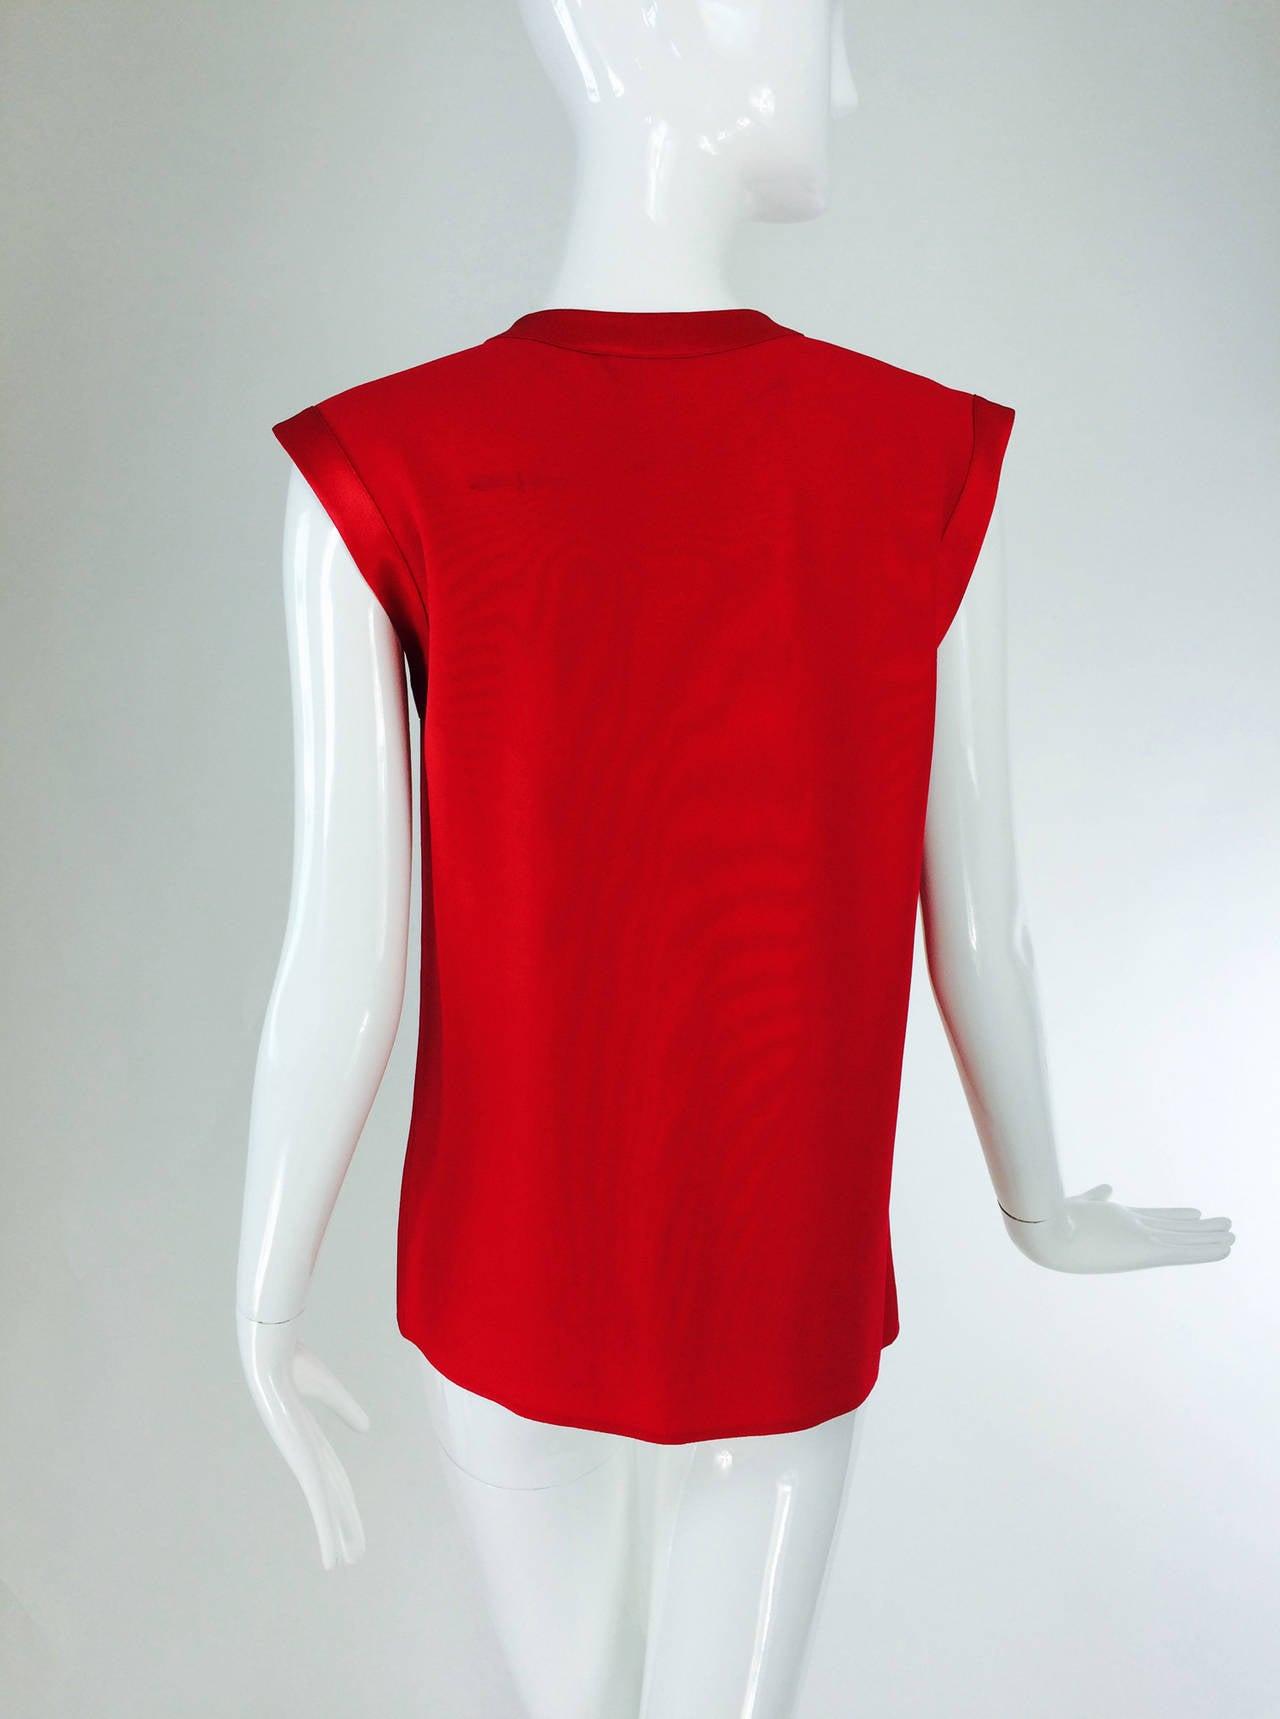 Yves St Laurent YSL Rive Gauche red satin back crepe sleeveless top 5